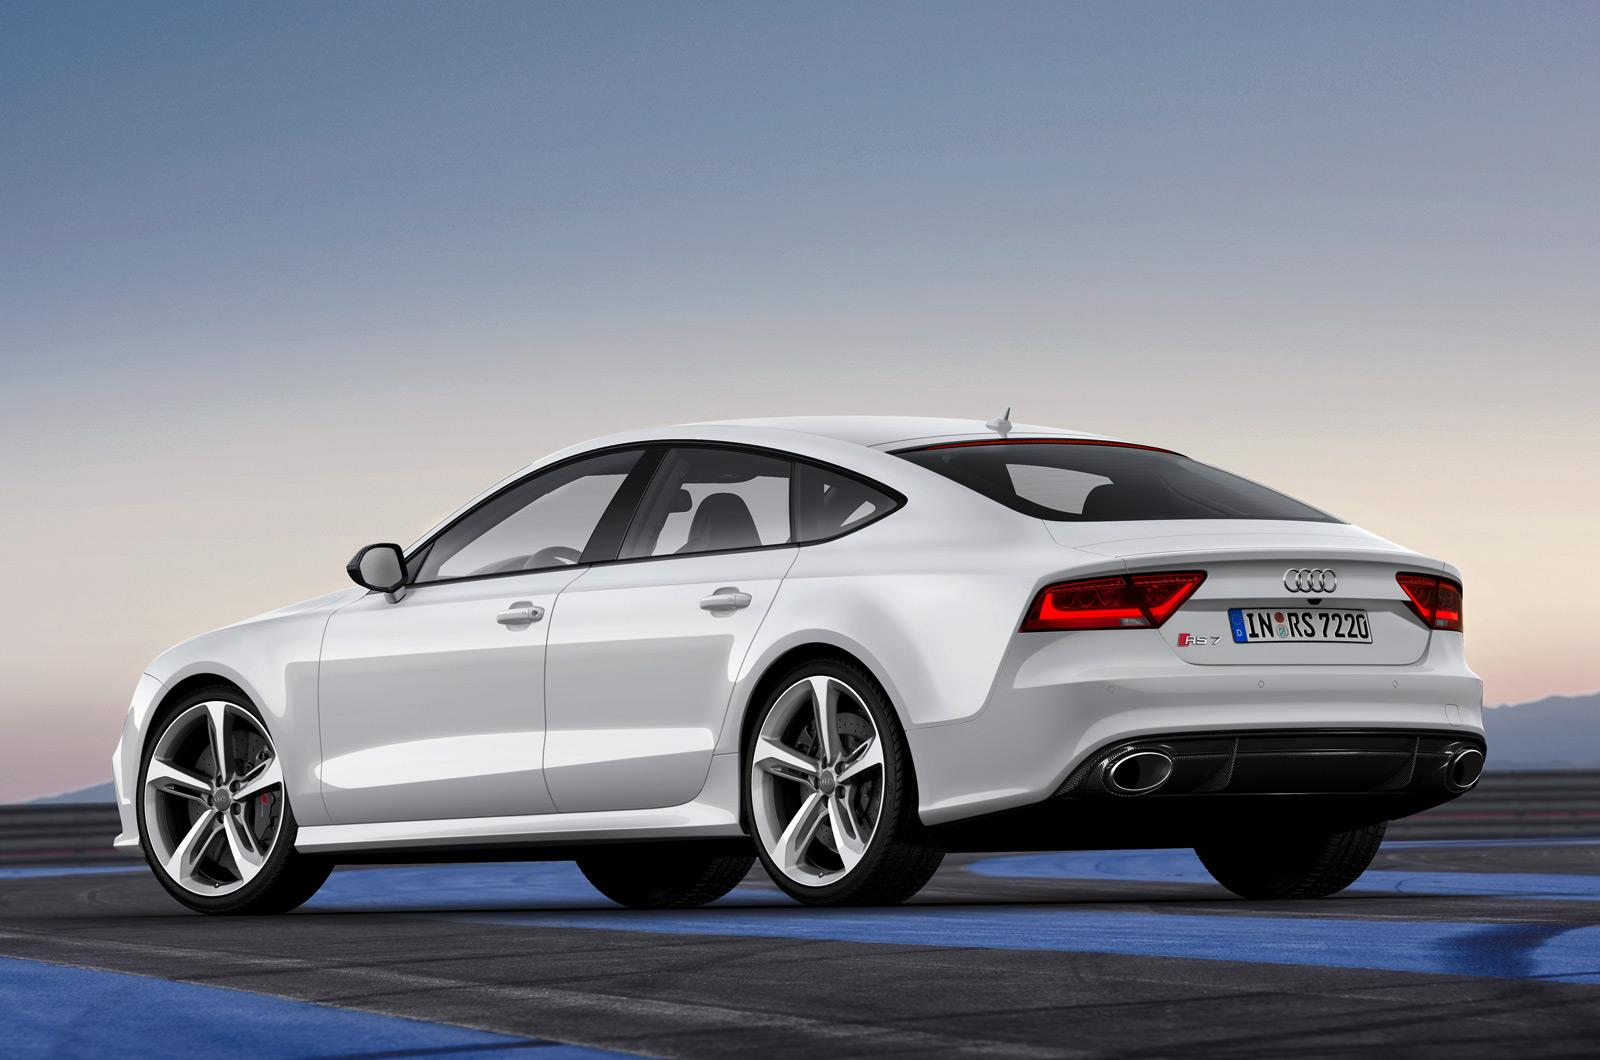 Audi RS 7 Sportback - Diseno-art: www.diseno-art.com/news_content/2013/01/audi-rs-7-sportback